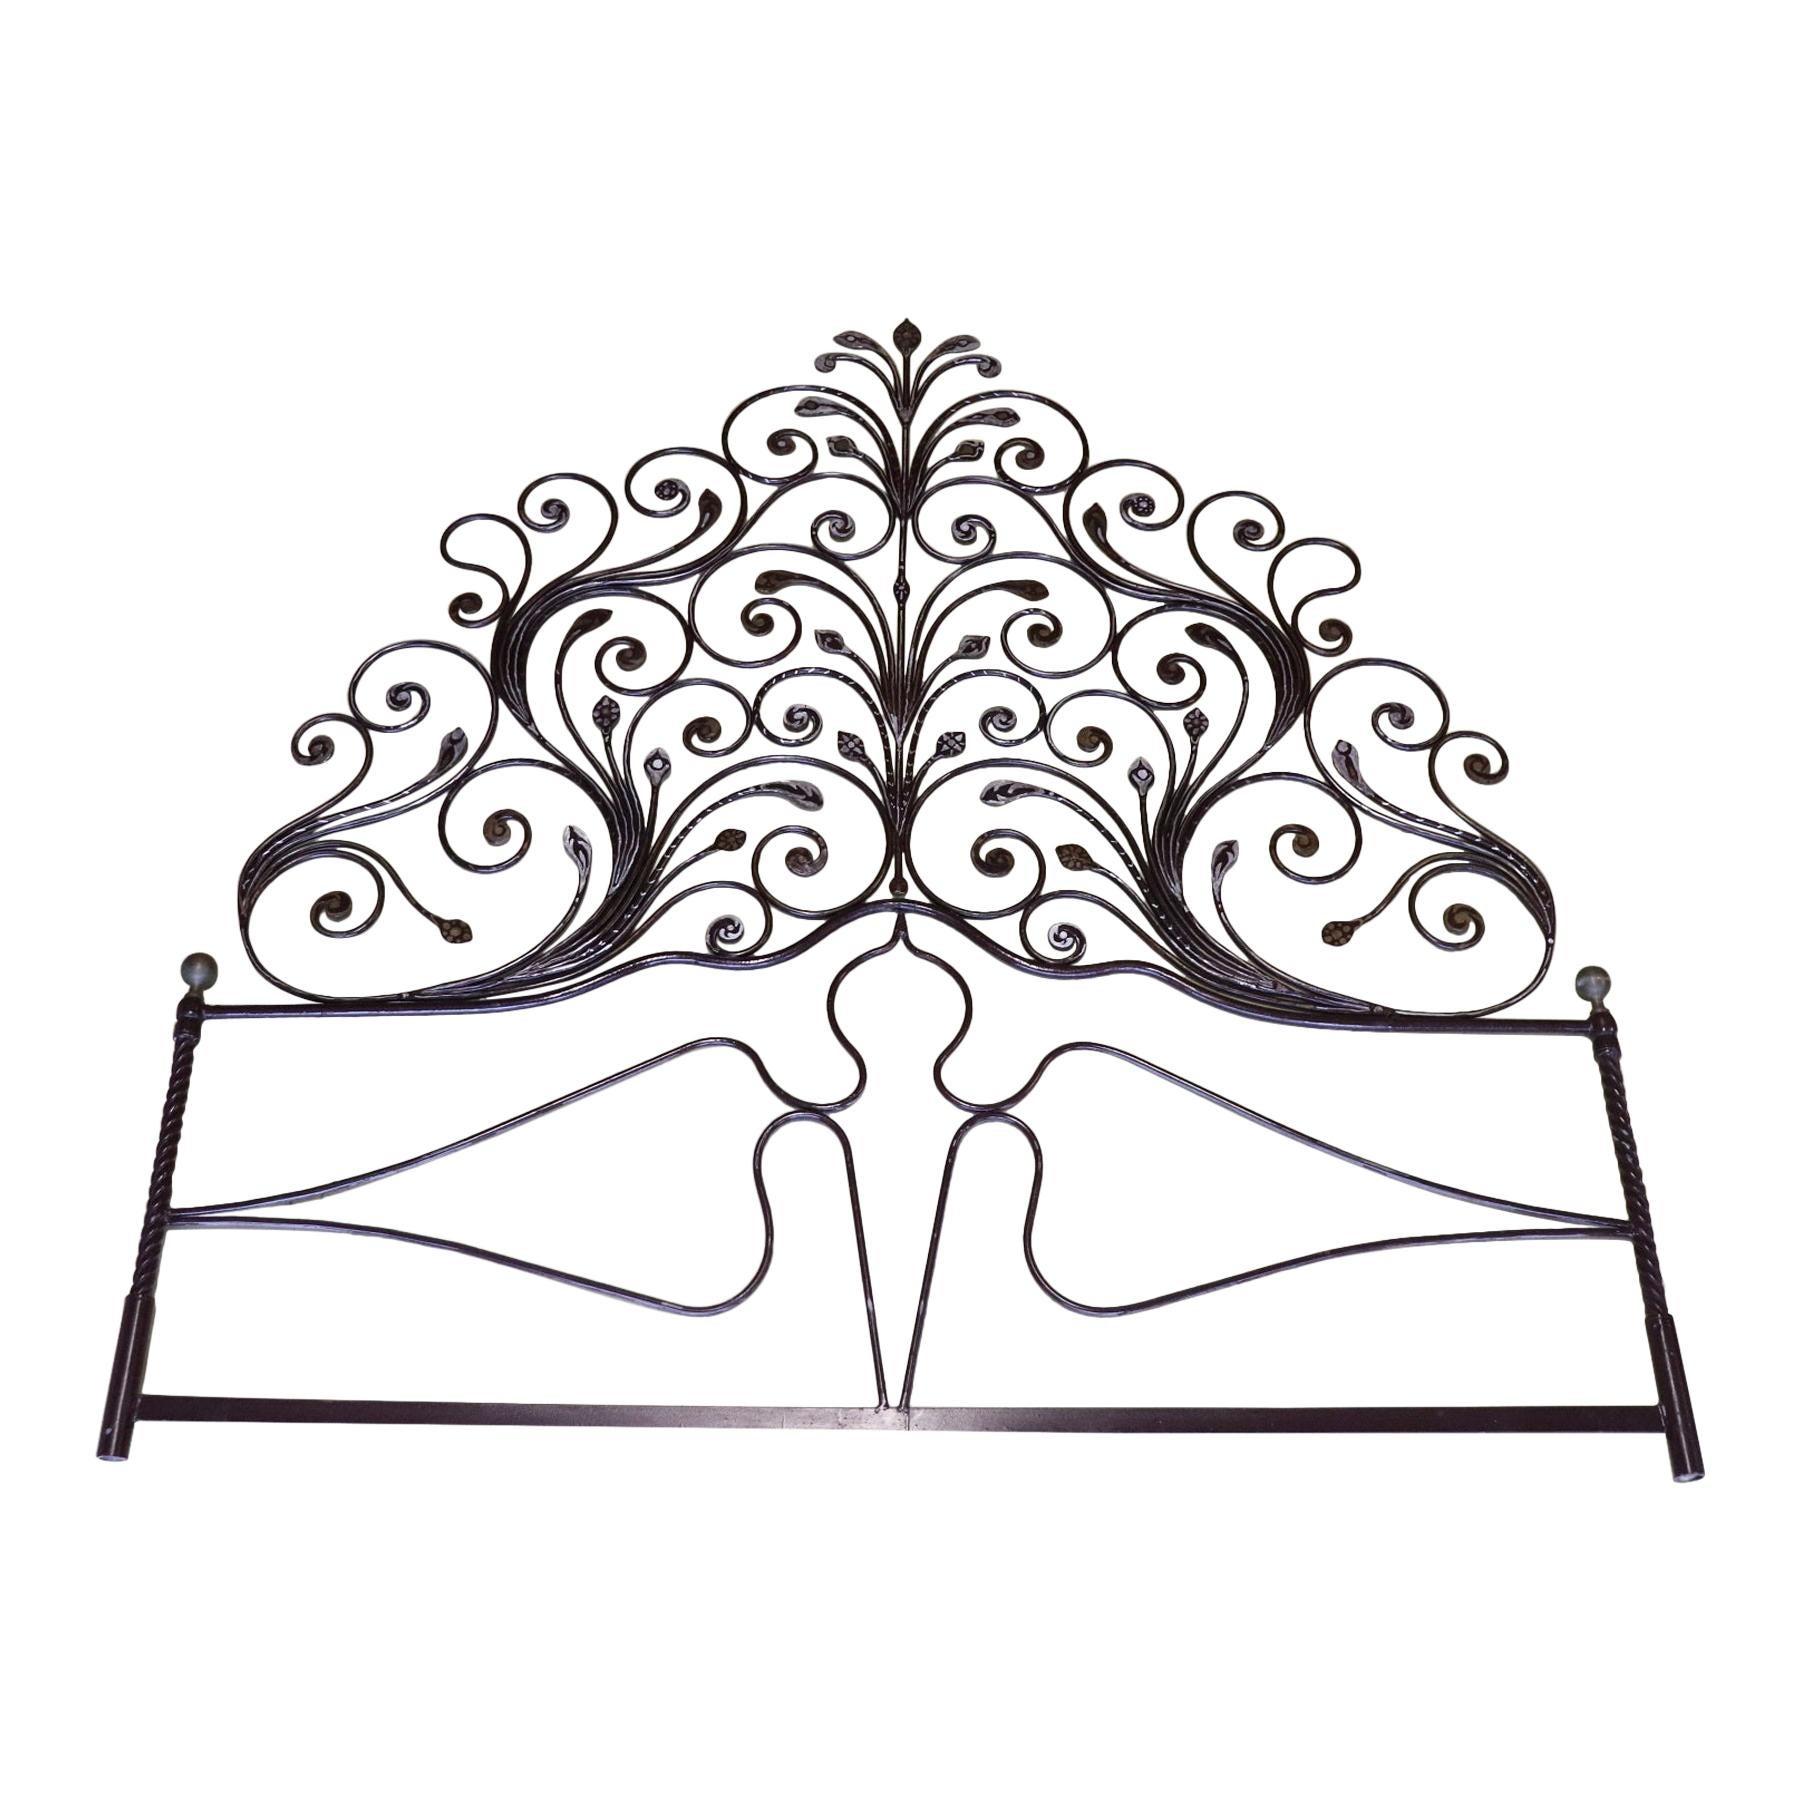 20th Century Italian Baroque Style Silvered Wrought Iron Headboard